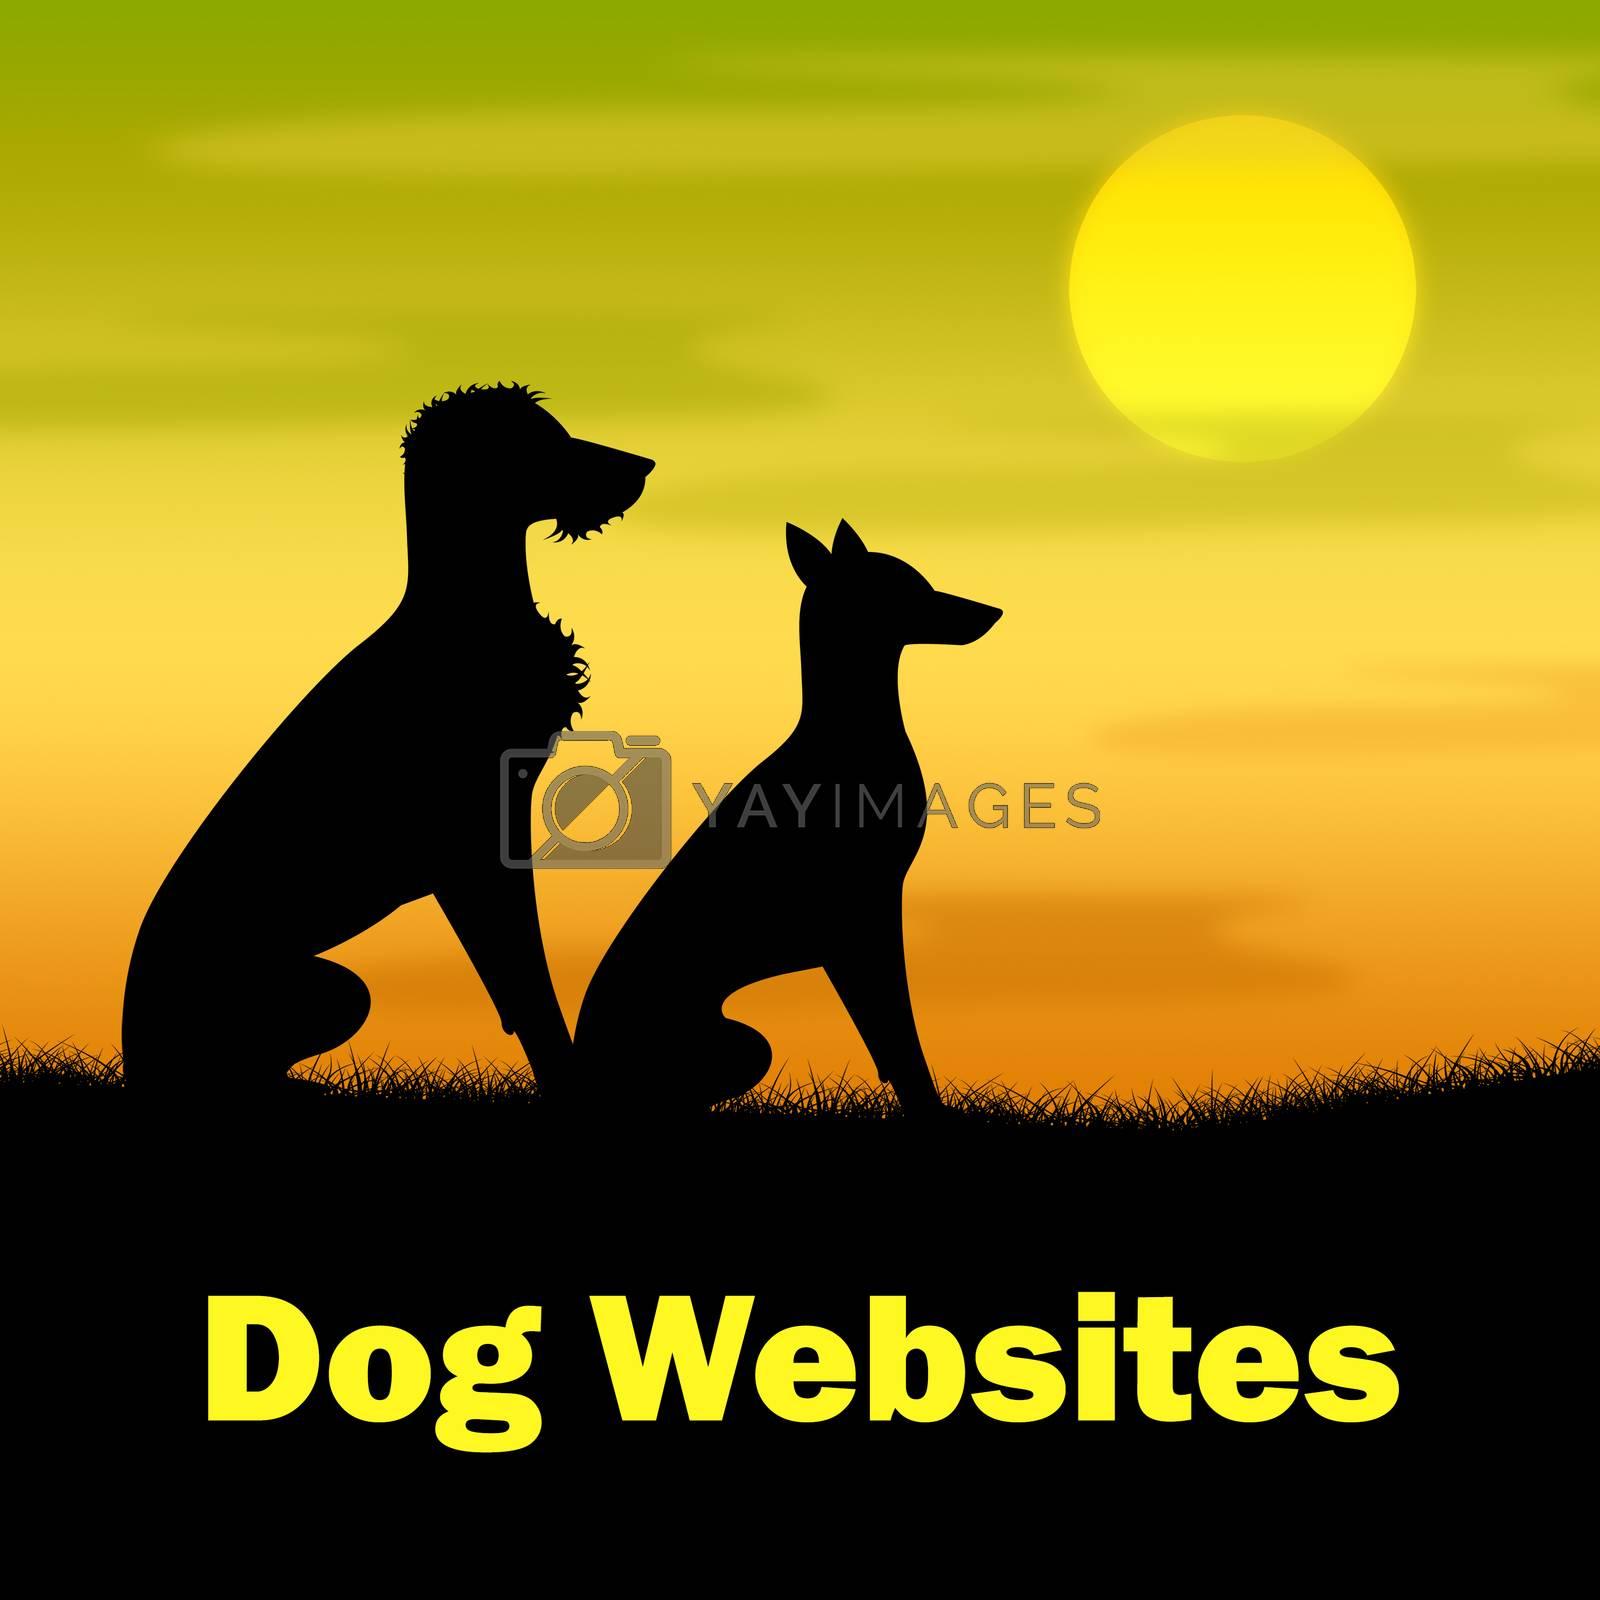 Dog Websites Indicating Pet Pasture And Nighttime